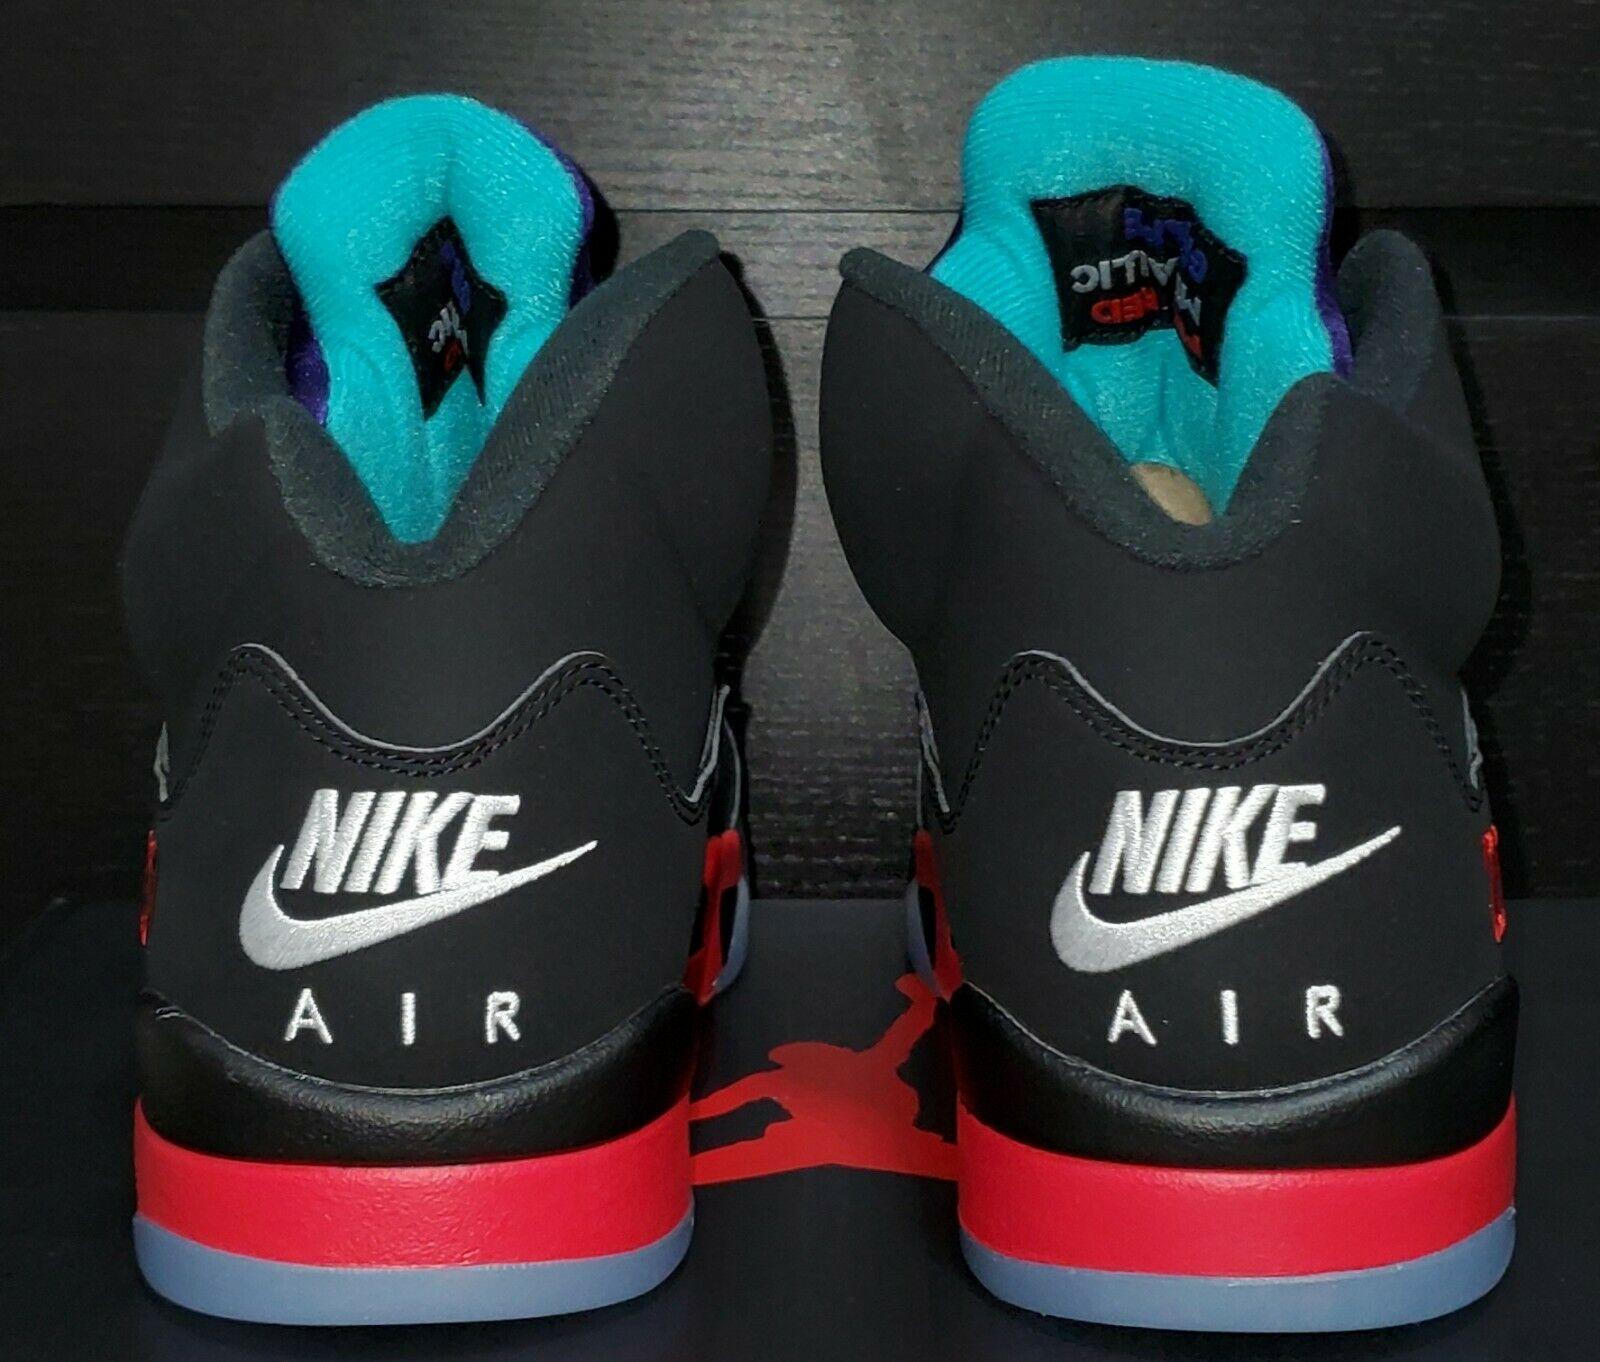 Air Jordan 5 Top 3 CZ1786-001 backview